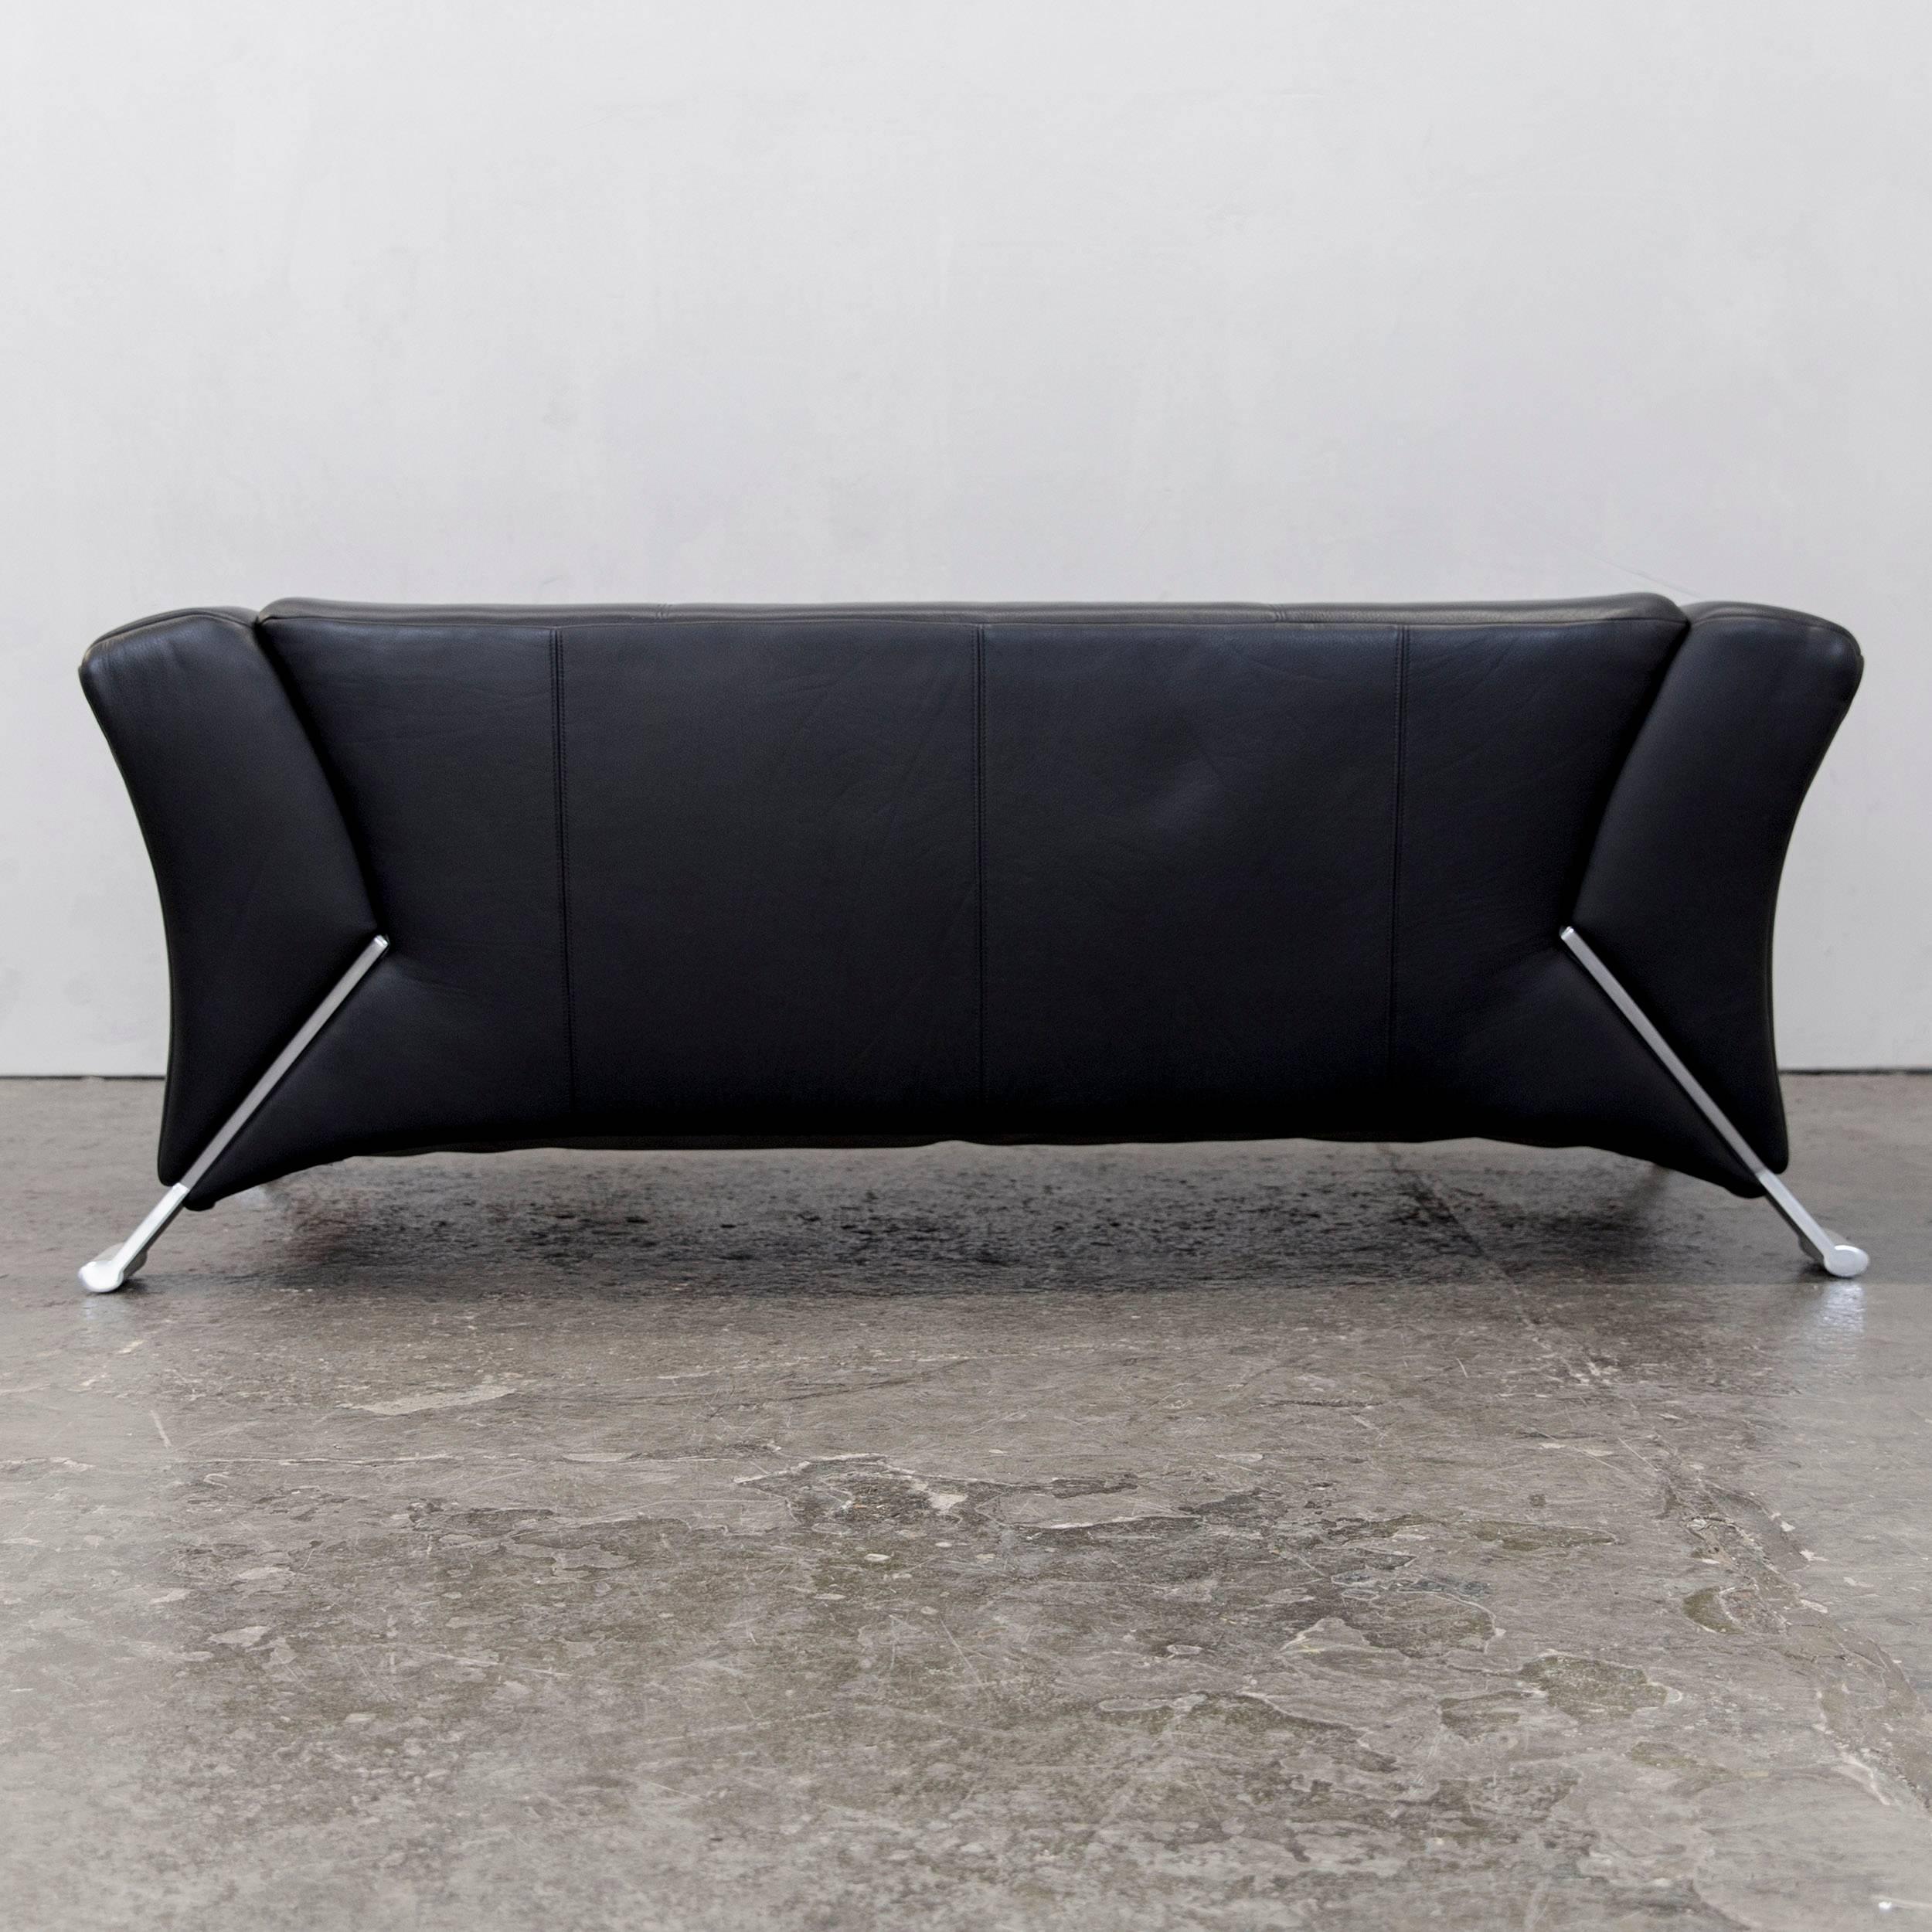 Rolf Benz 322 Designer Sofa Black Two-Seat Leather Modern at 1stdibs